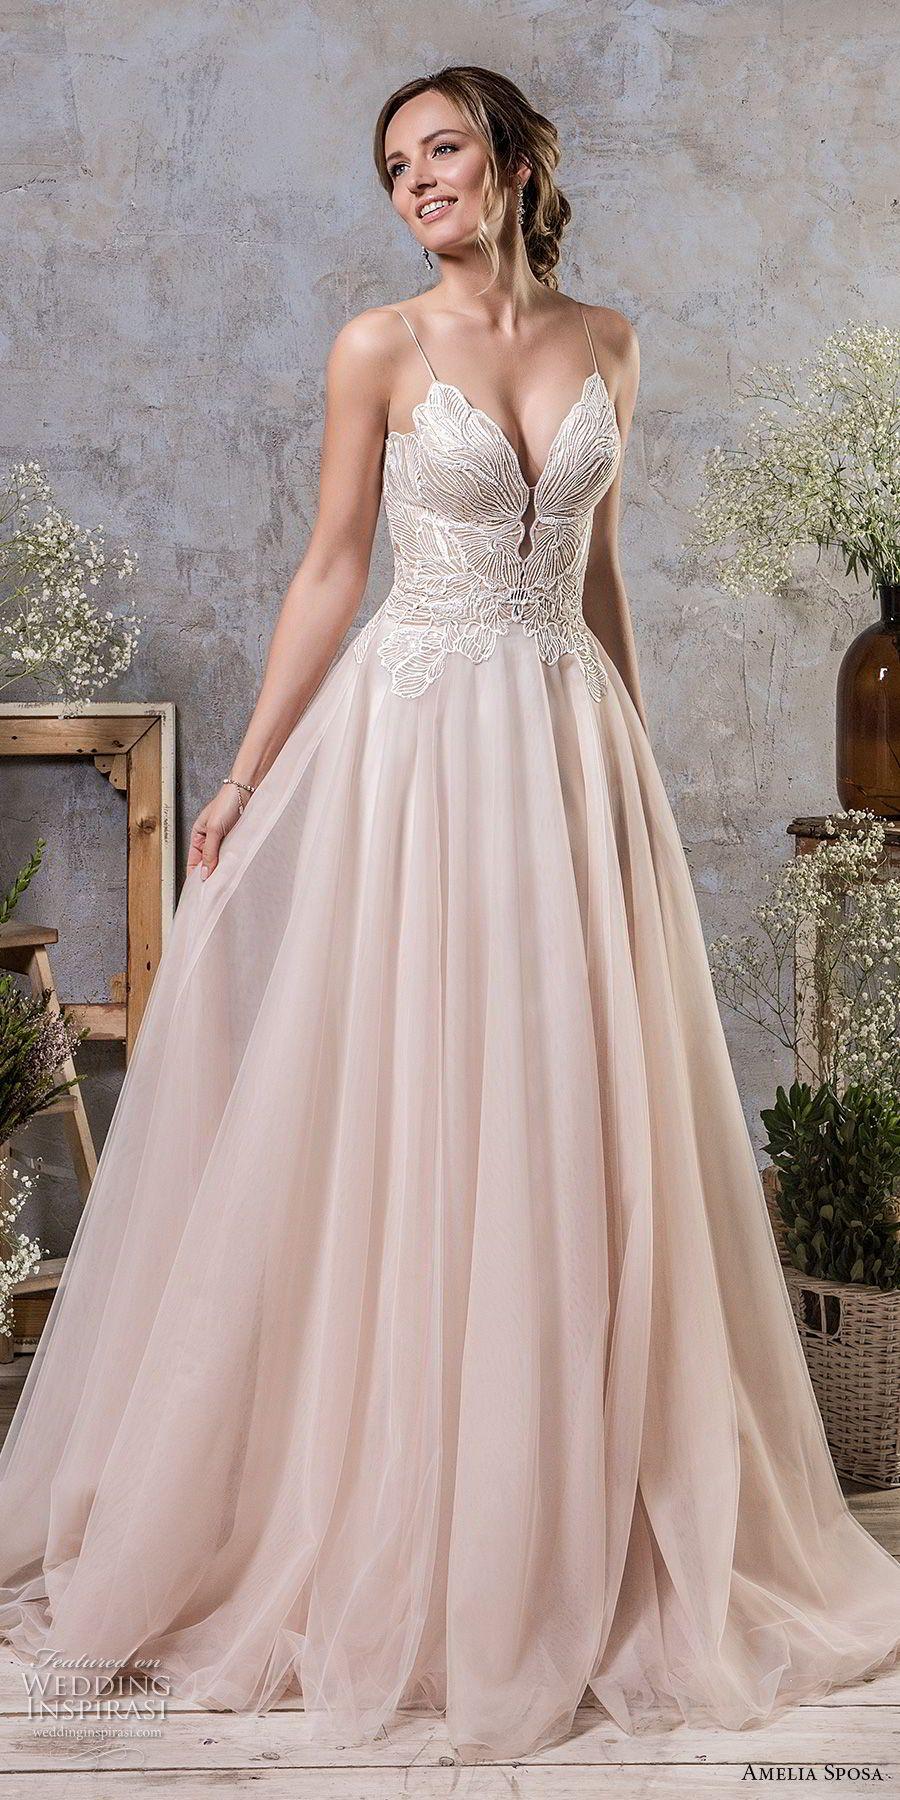 Amelia Sposa Fall 2018 Bridal Spaghetti Strap Deep Sweetheart Neckline Heavily Embellished Bodice Blush A Line Wedding Dress Corset Back Chapel